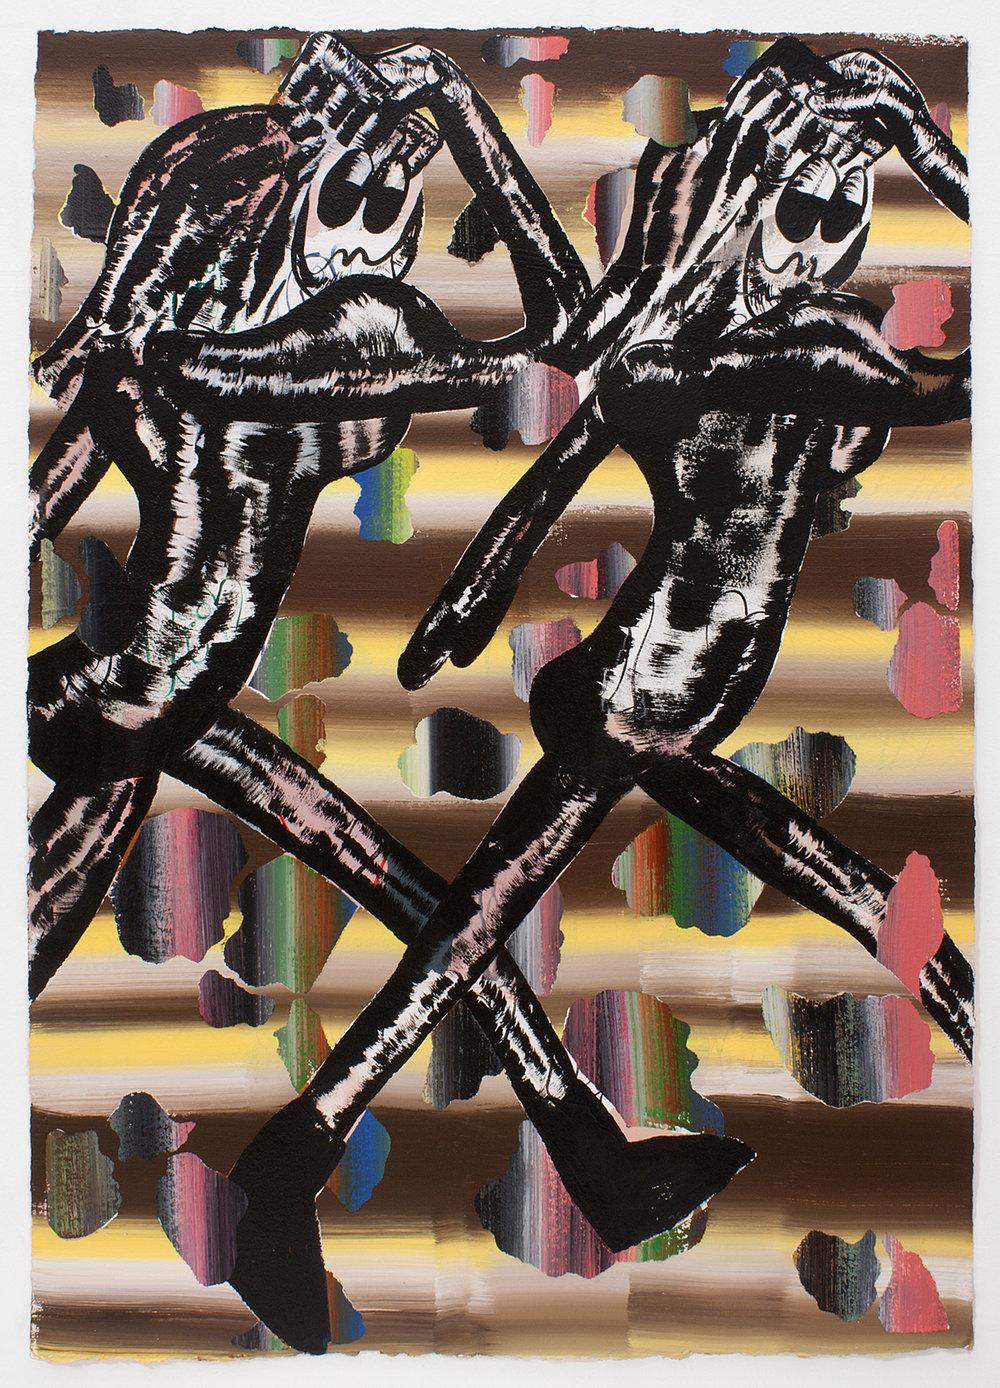 Bridget Mullen - We Break Symbolic, 2016Acrylic paint on paper42 x 29.5 in/106.68 x 74.93 cmFramedContact for price